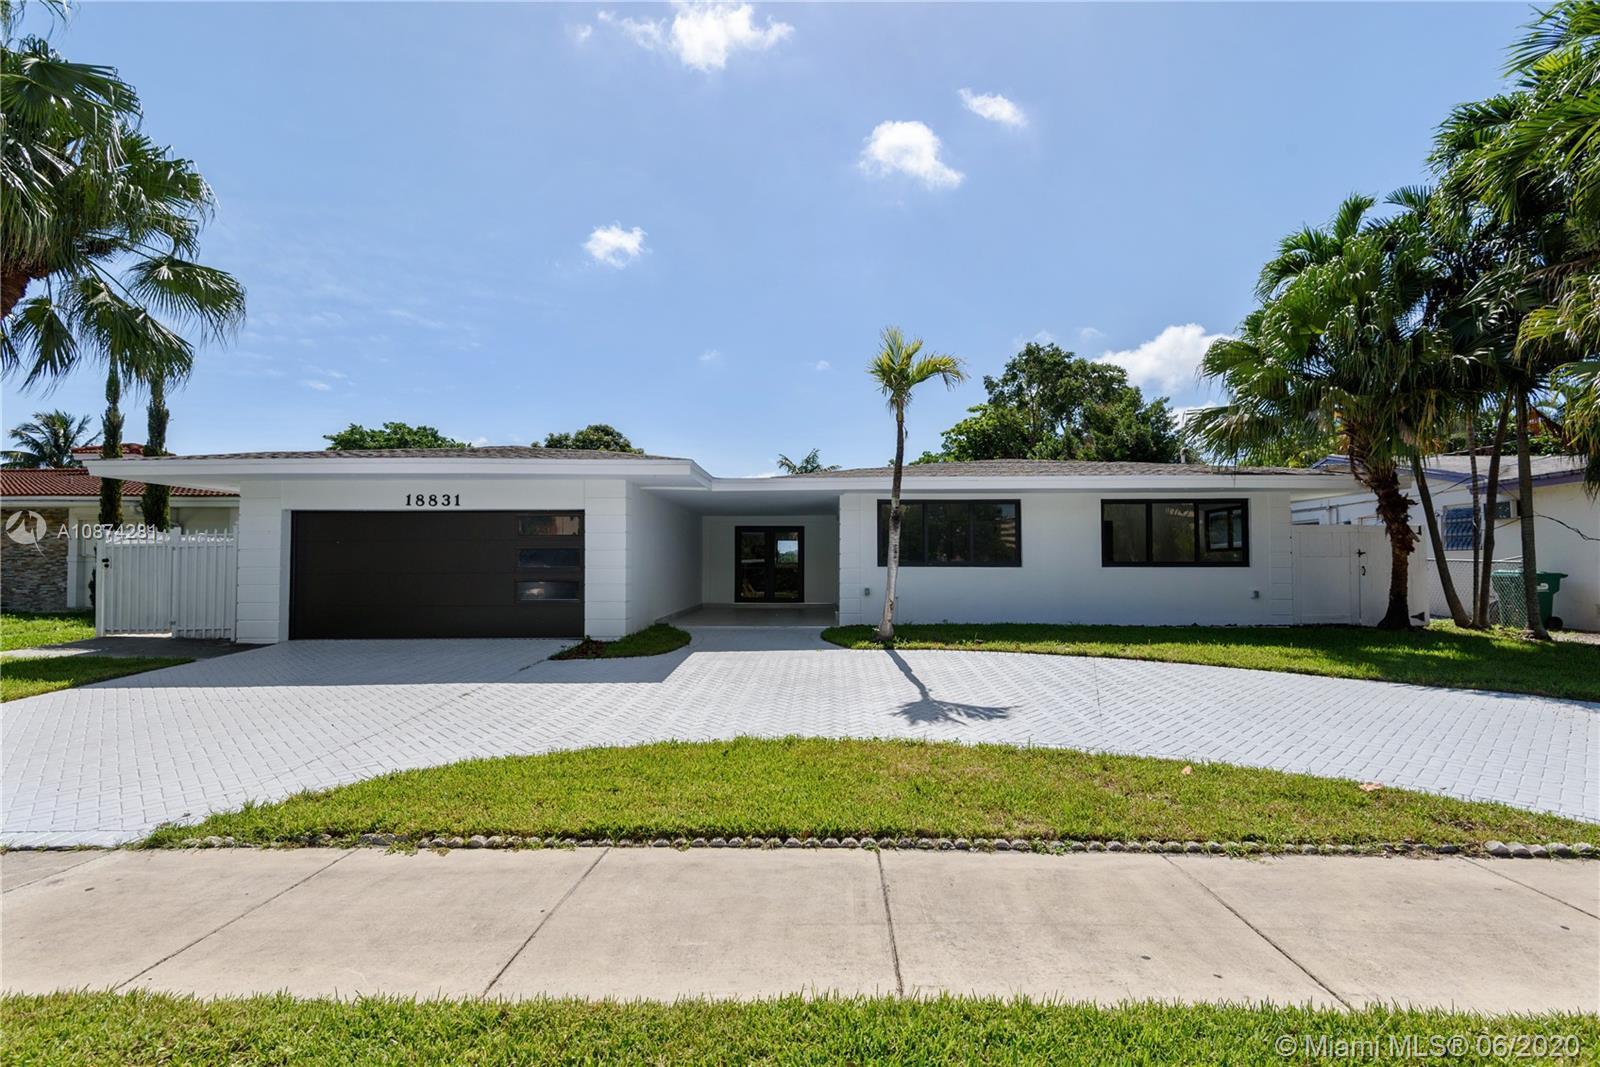 Greyknoll Estates - 18831 NE 18th Ave, Miami, FL 33179